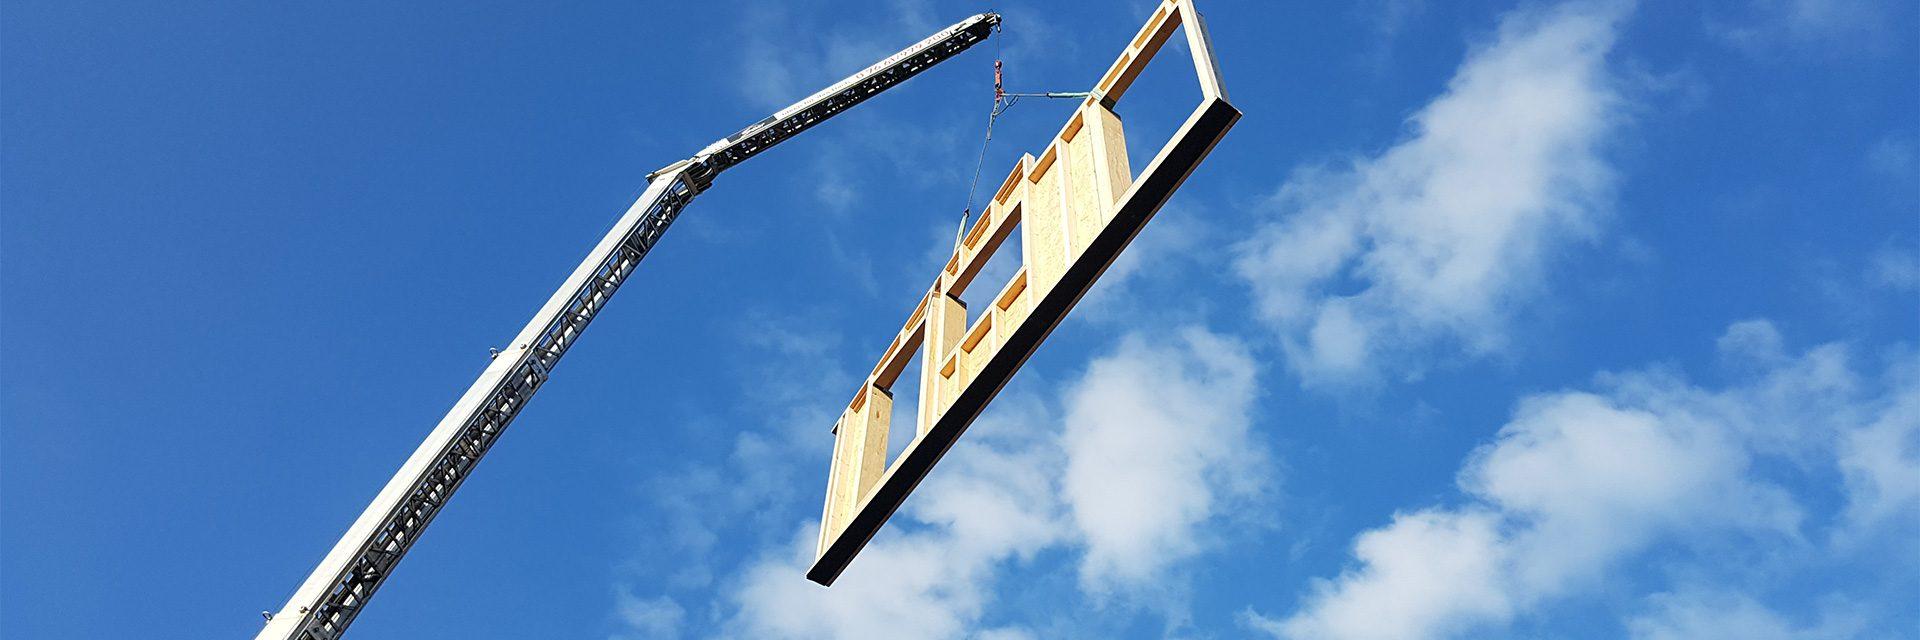 Energiesparende Holzbausysteme